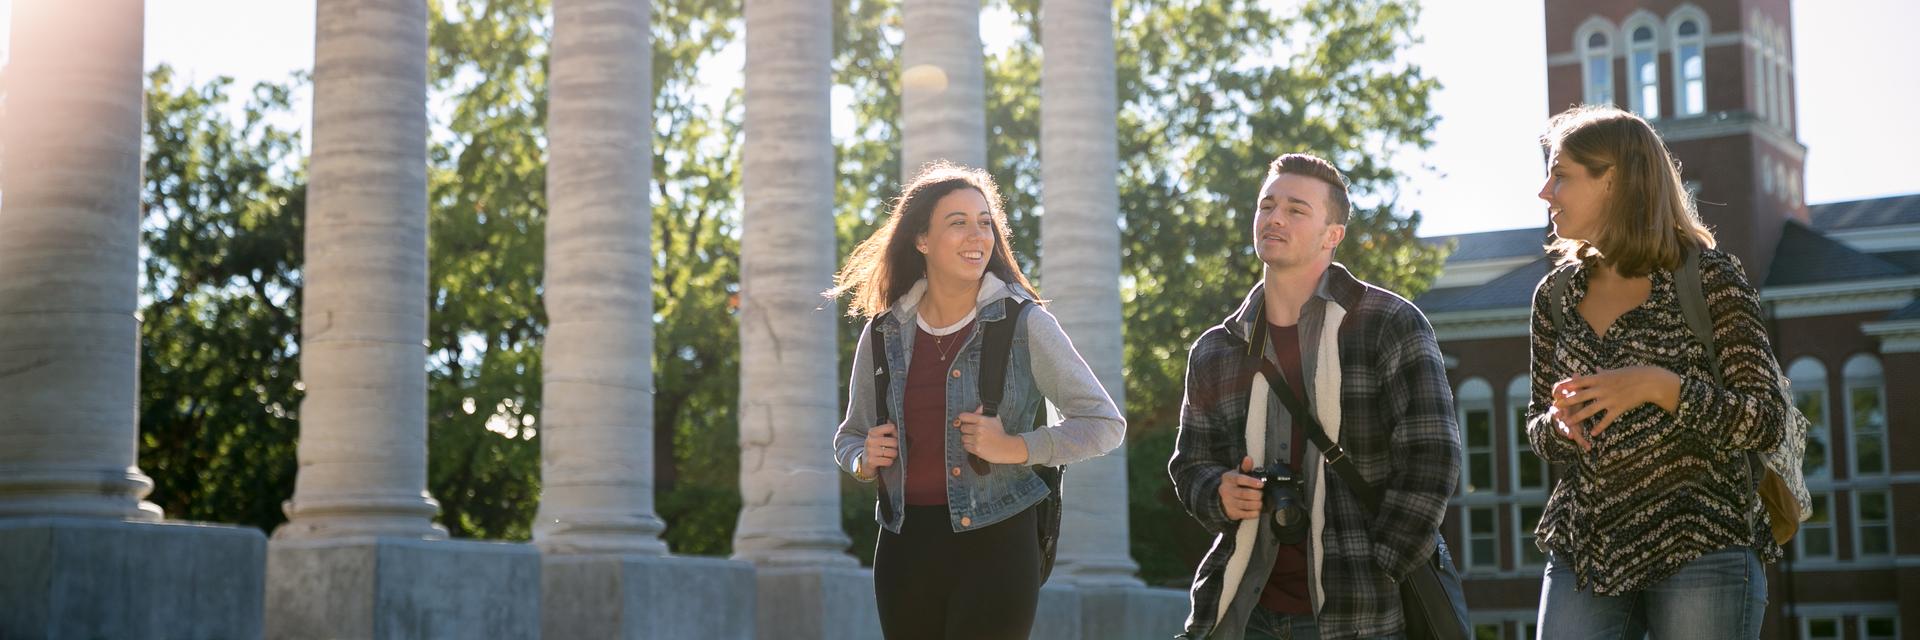 Students walking across Francis Quadrangle